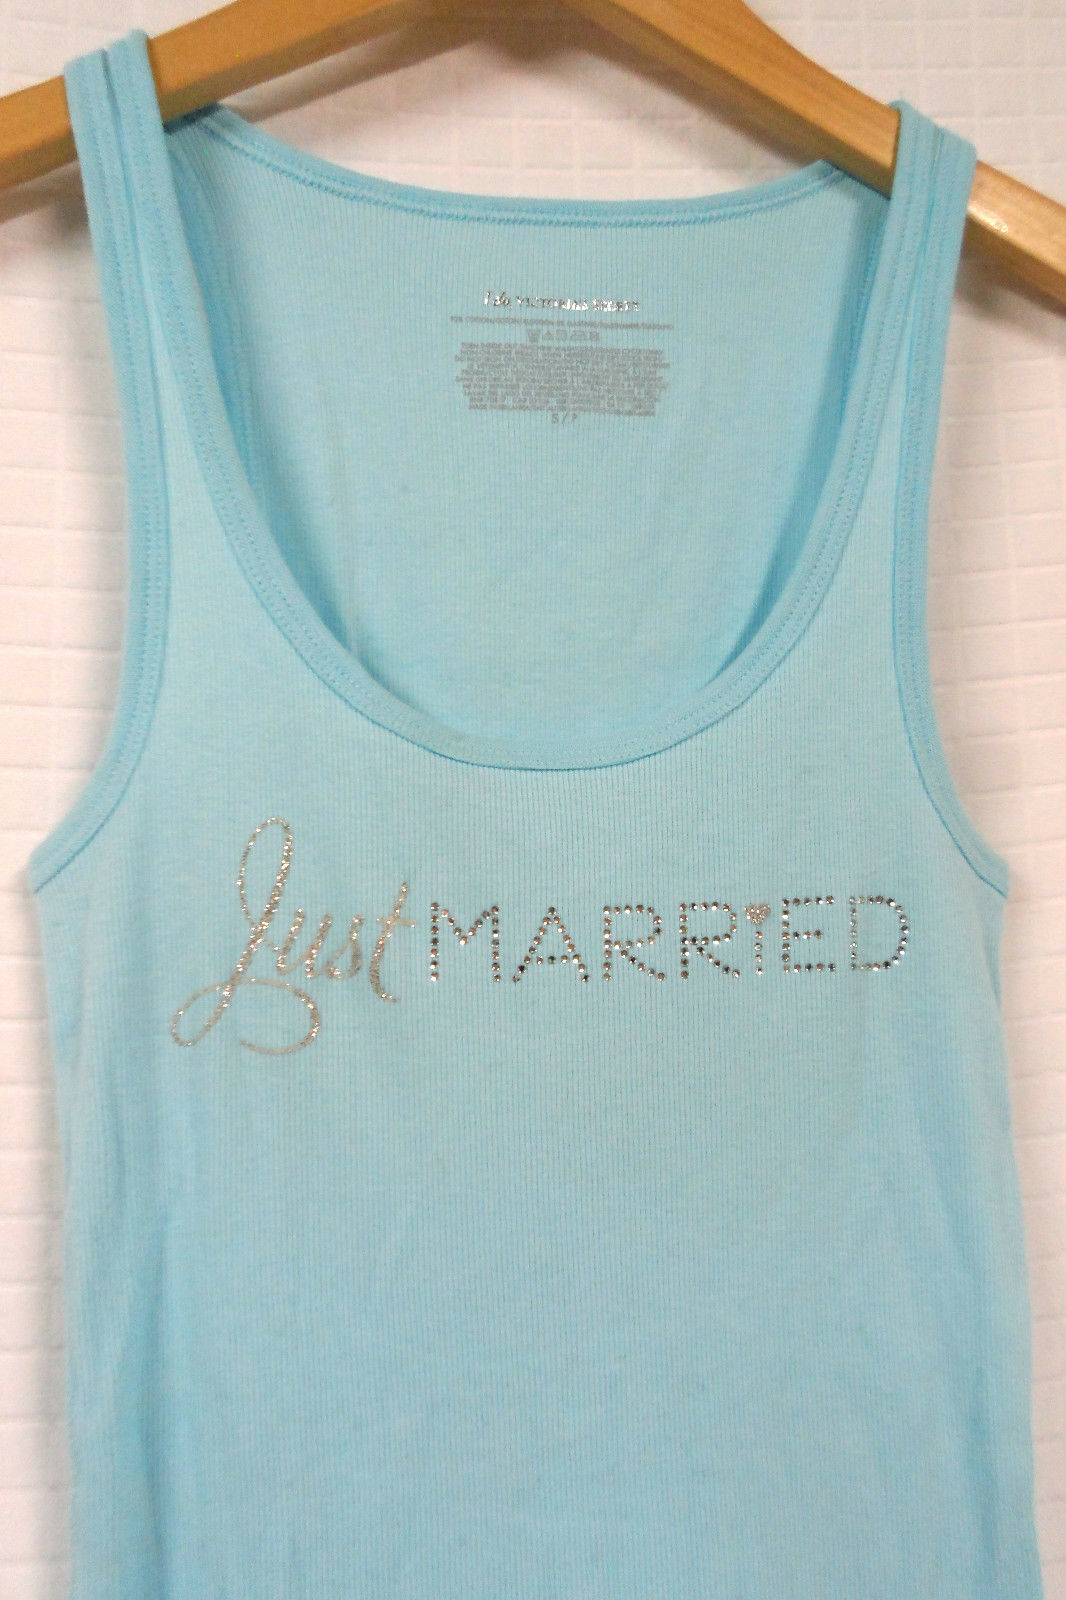 VICTORIA'S SECRET I Do LIGHT Blue JUST Married RHINESTONE Bride TANK TOP Sz S